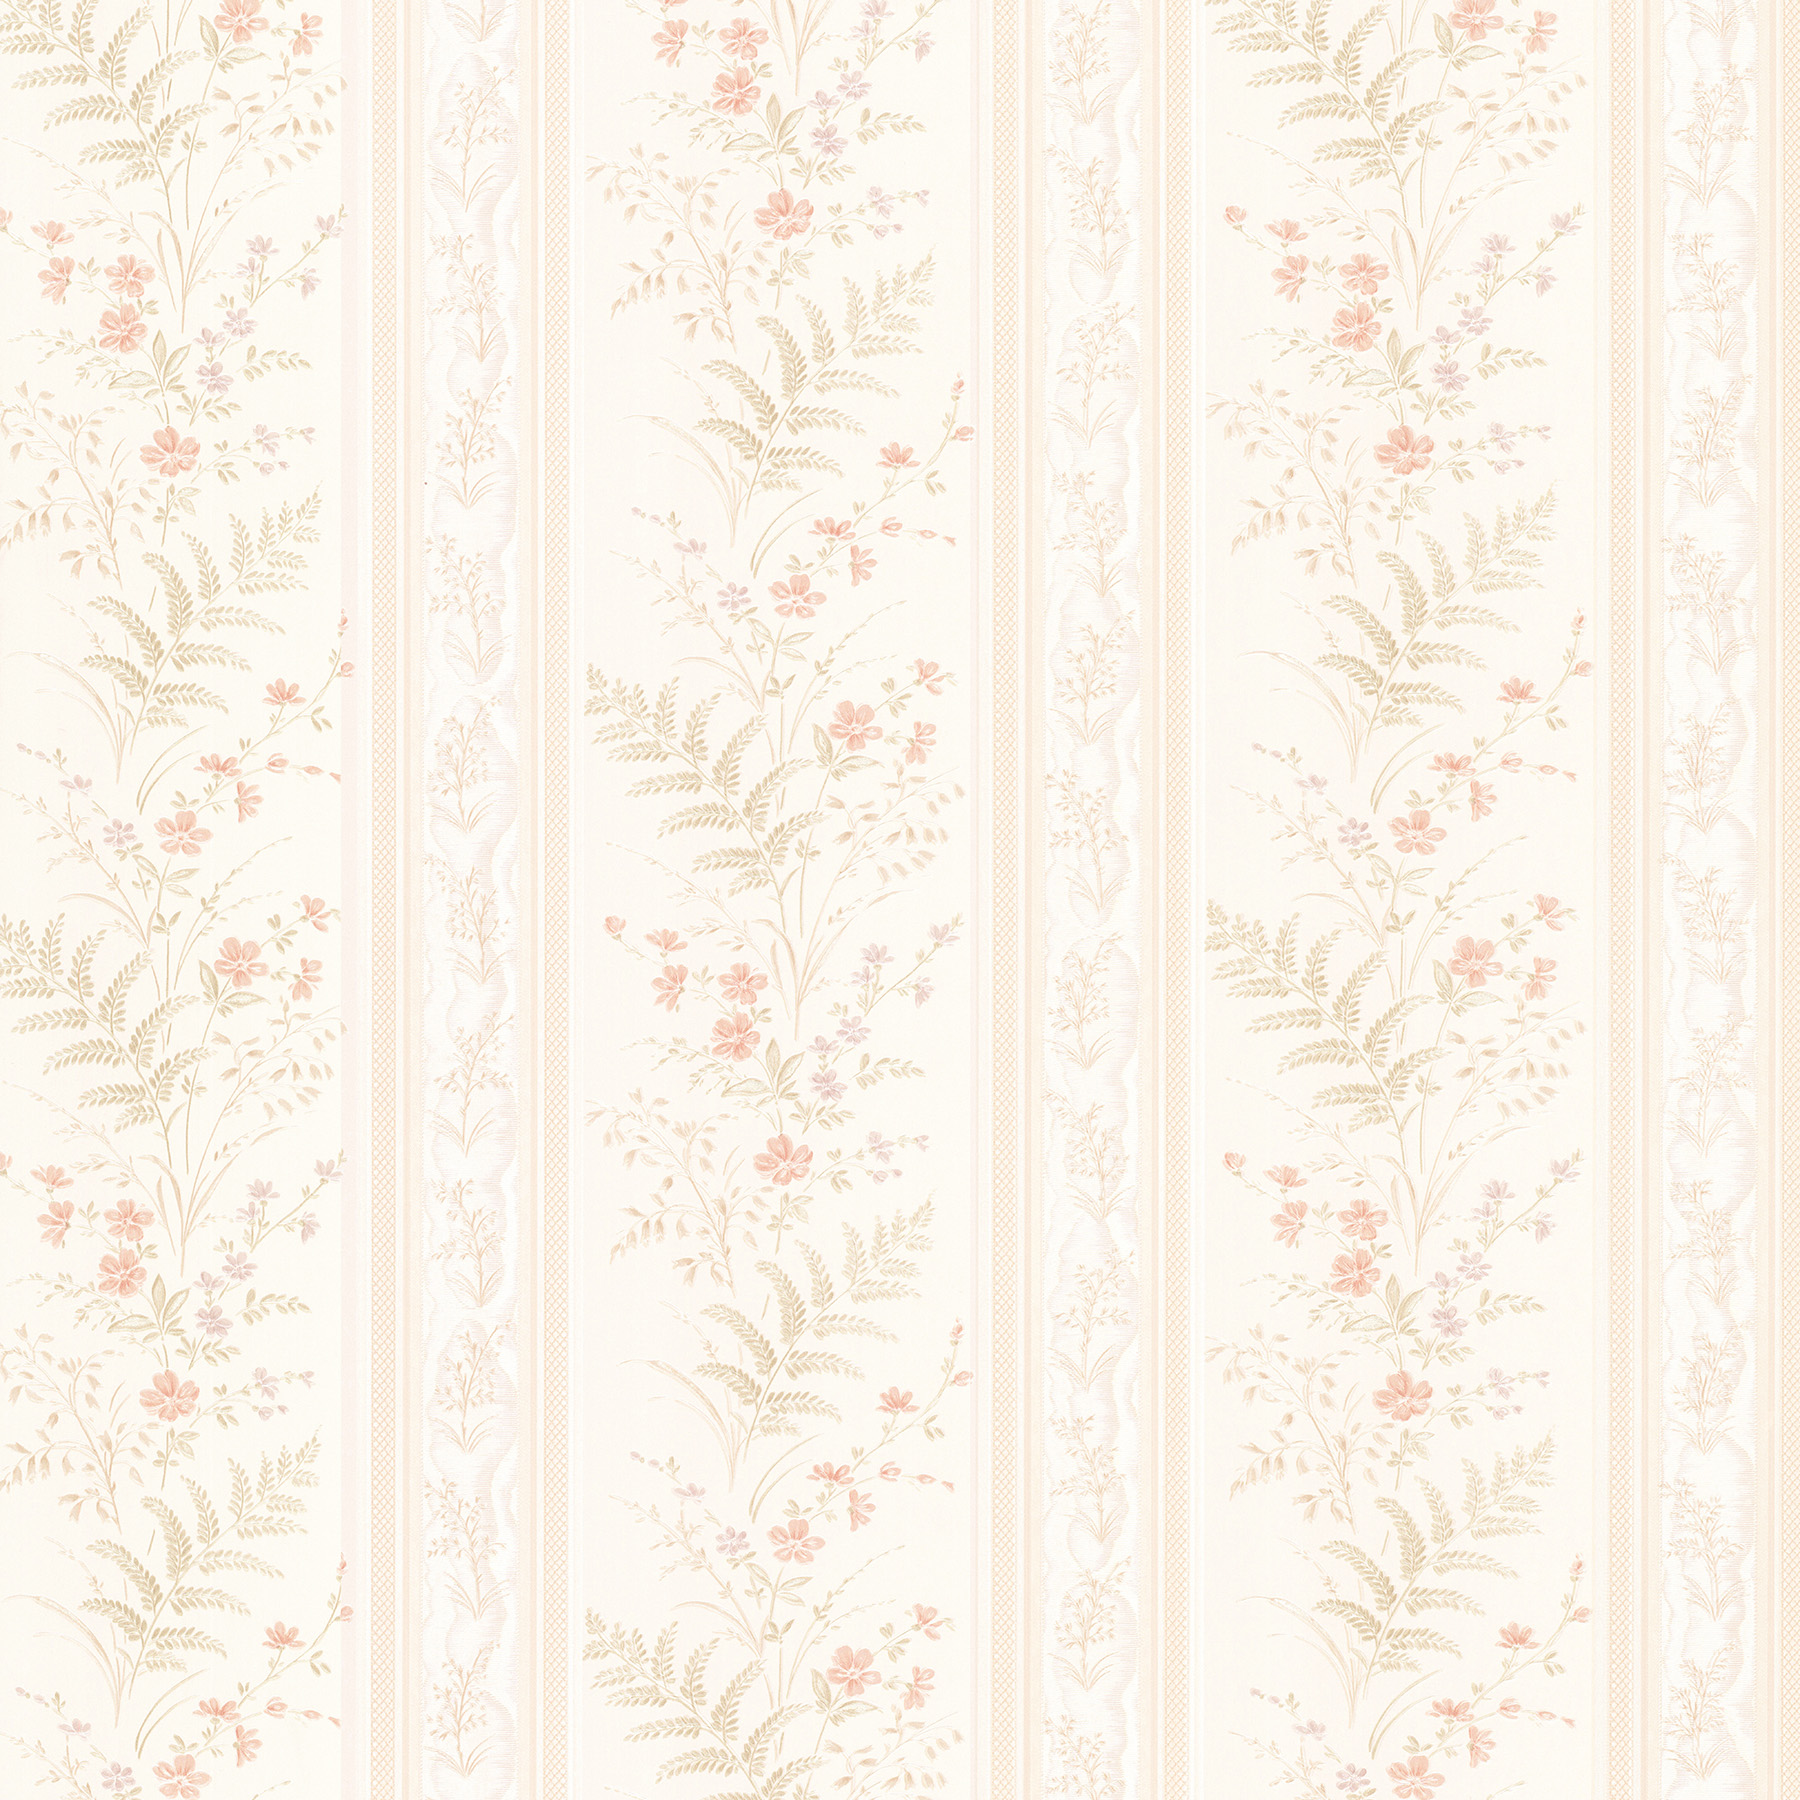 Picture of Bell Peach Wildflower Stripe Wallpaper